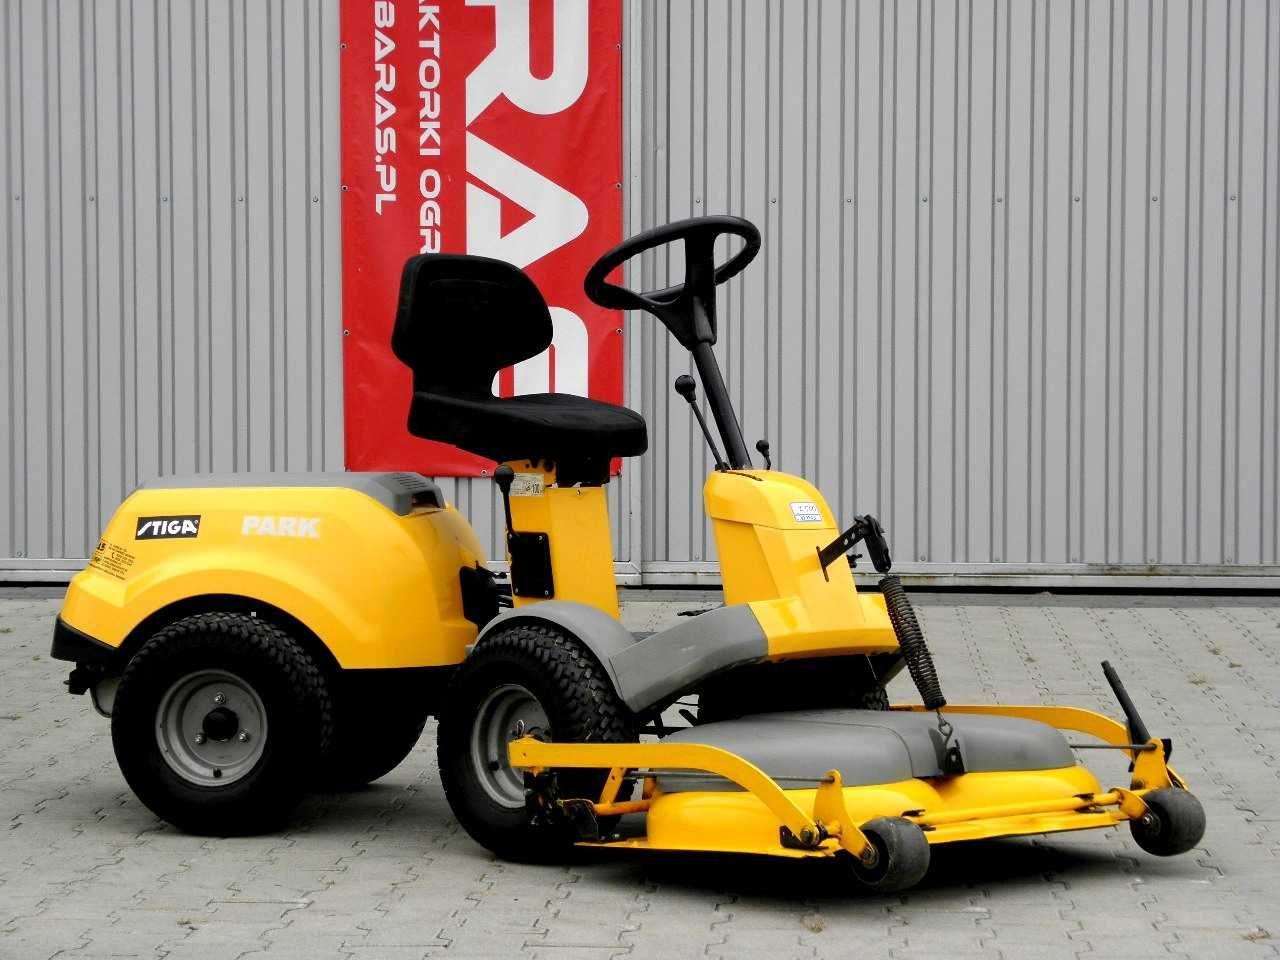 Traktorek kosiarka STIGA PARK (300903) - Baras